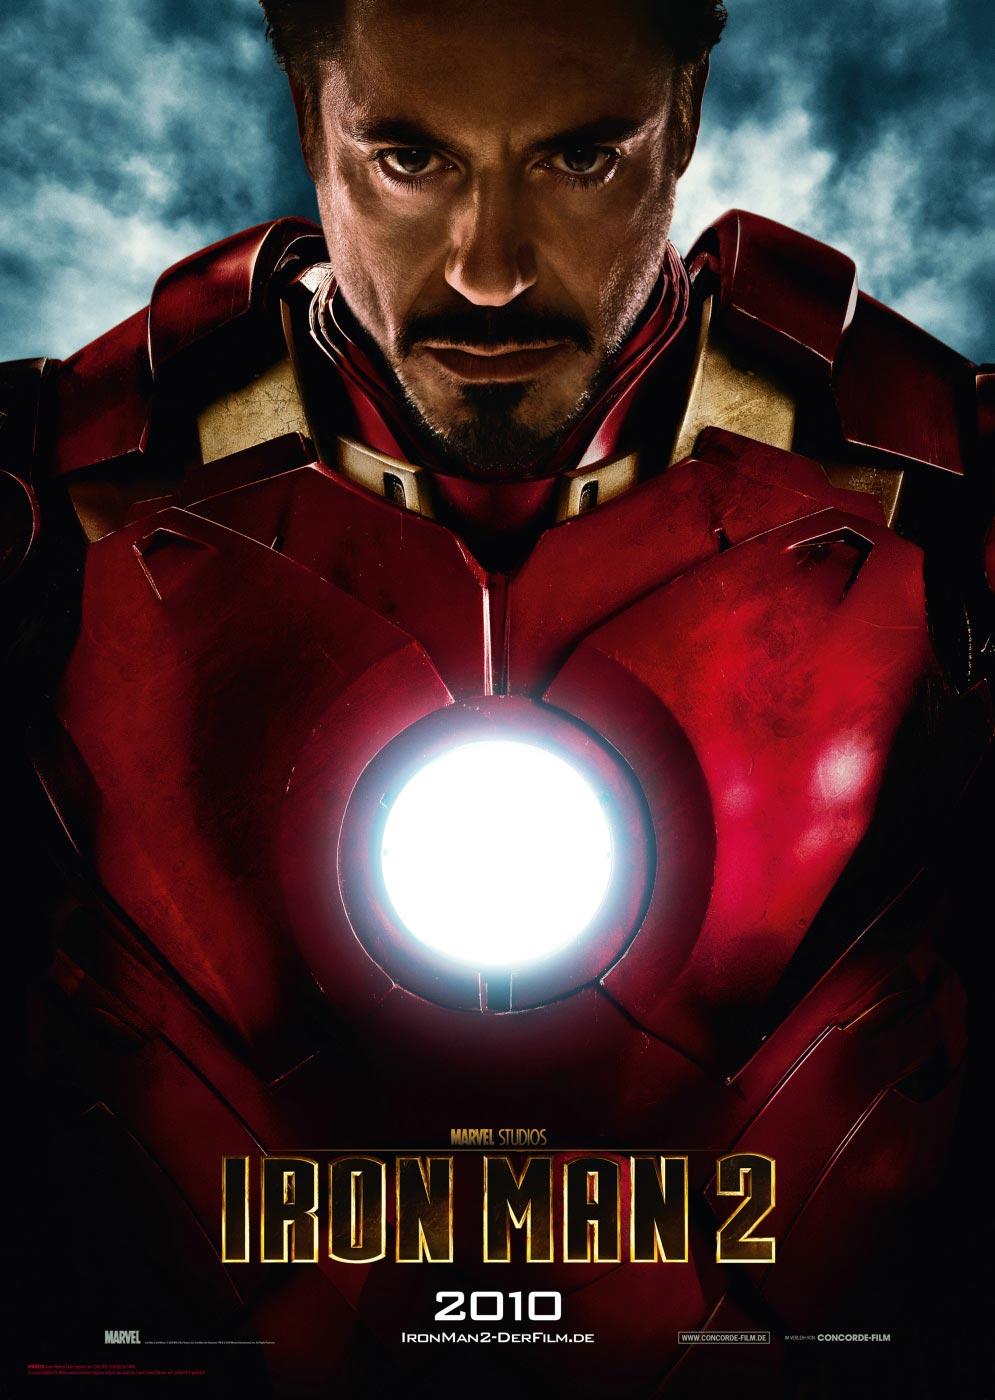 watch iron man 2 full movie online free